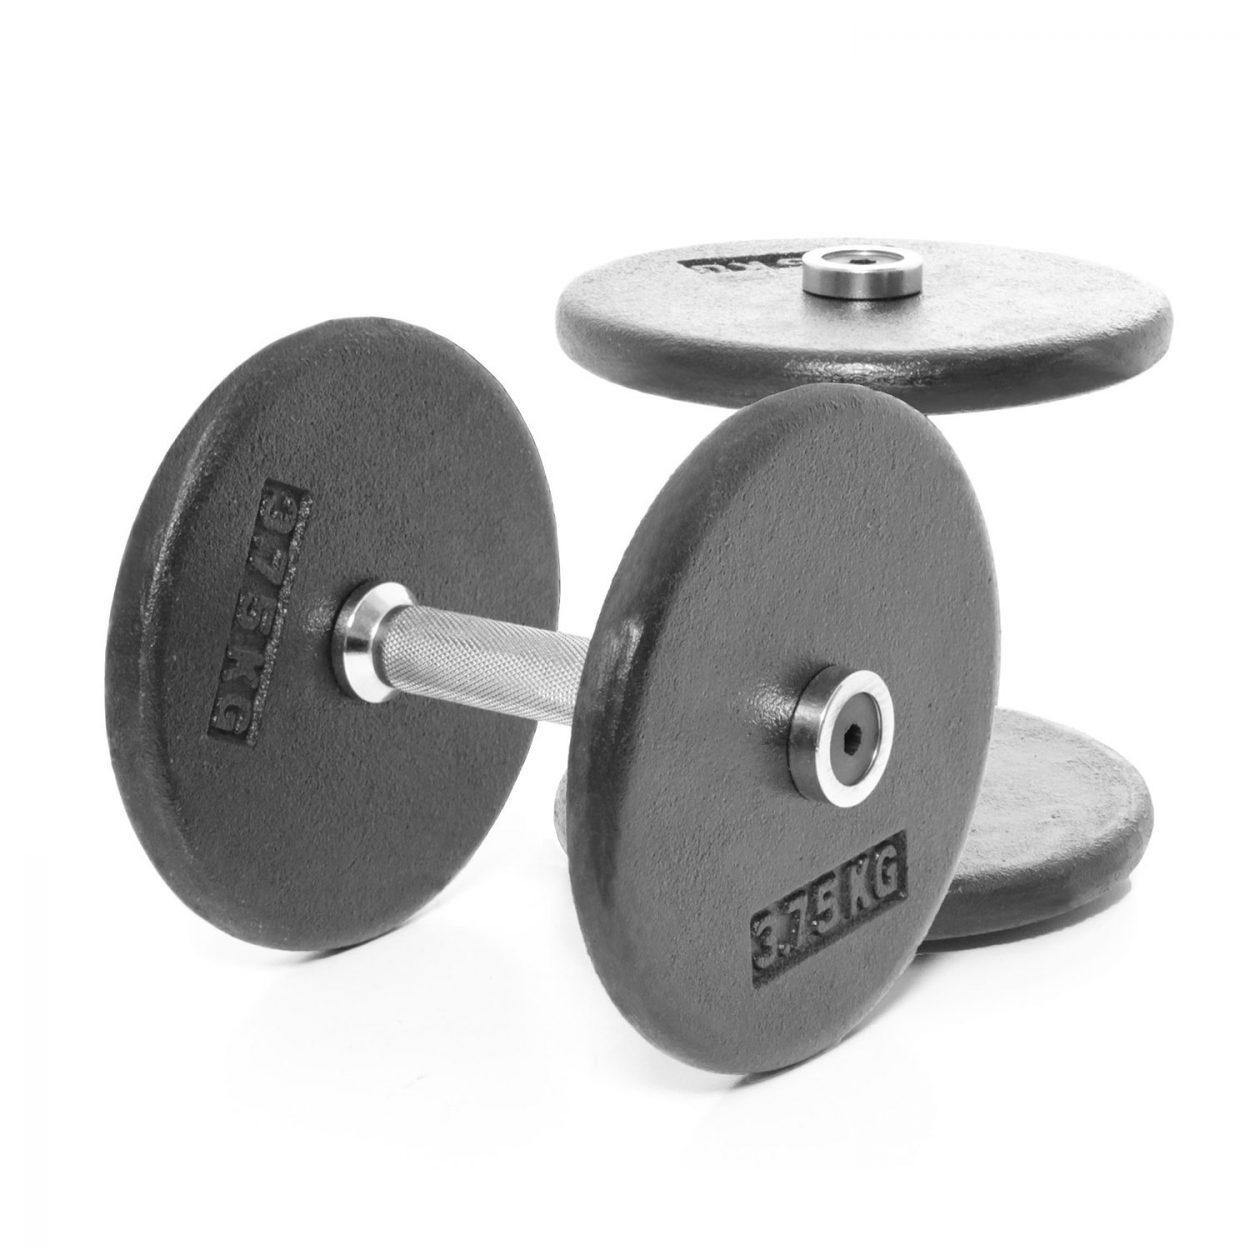 Body Power Pro-style Dumbbells 7.5kg (x2)